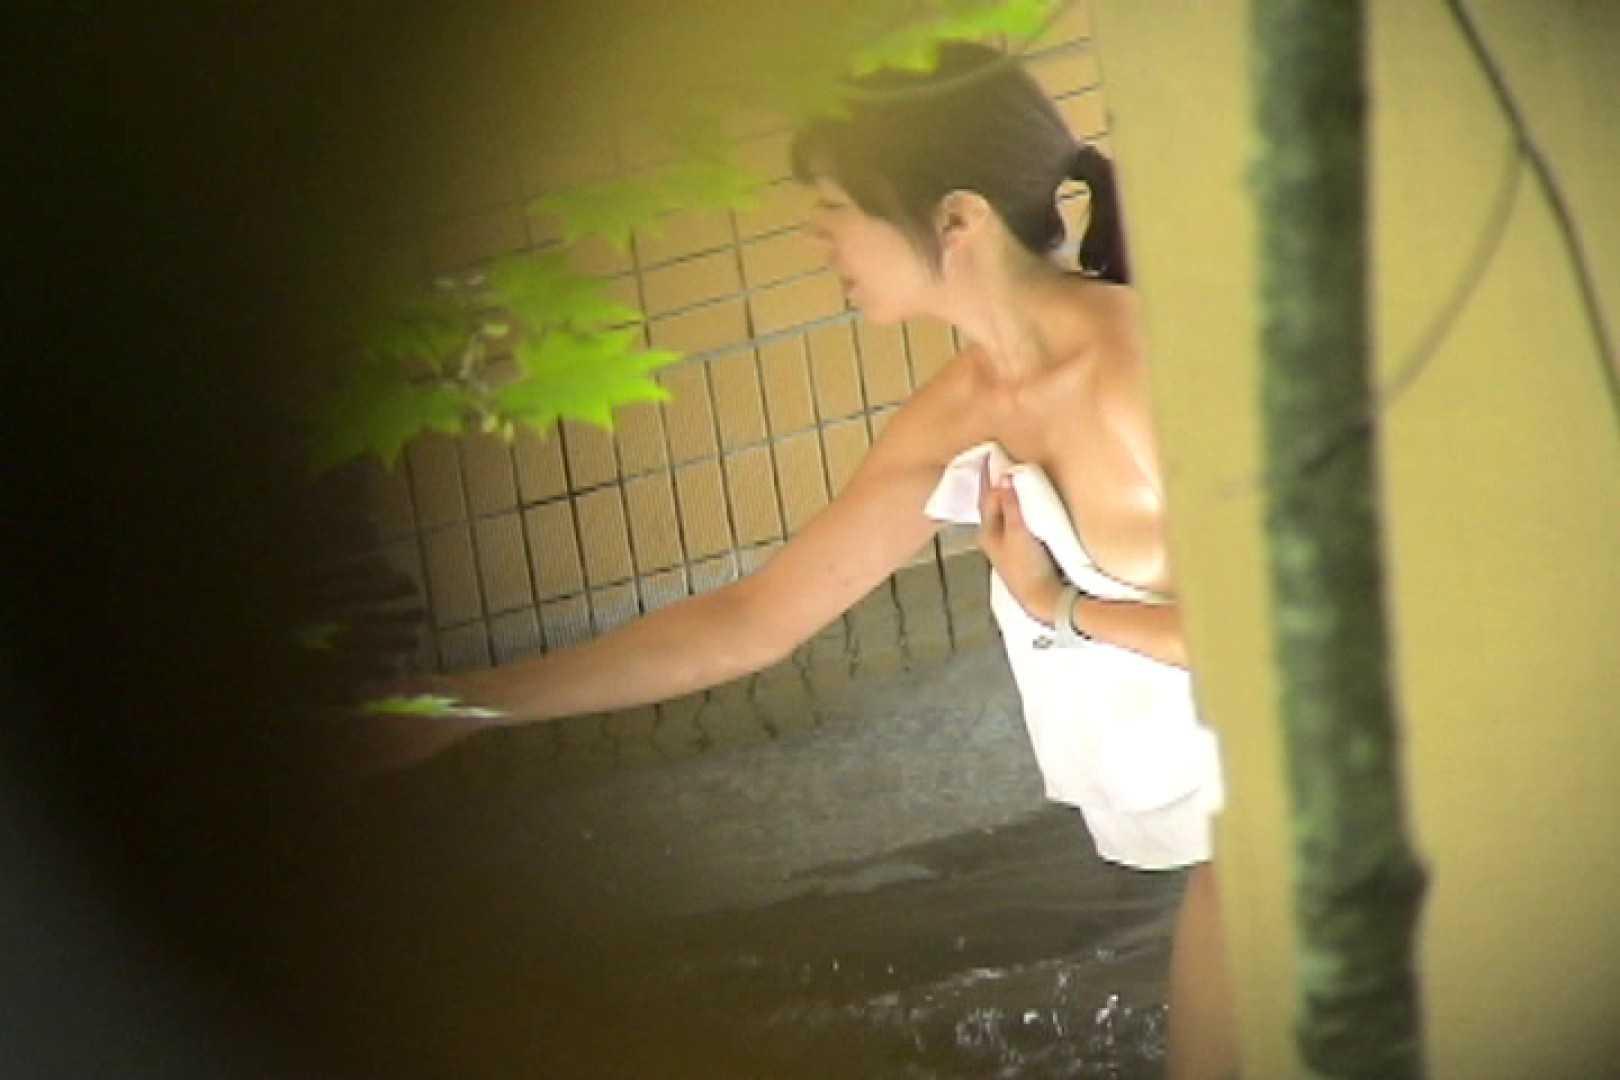 Aquaな露天風呂Vol.703 露天風呂 オメコ無修正動画無料 39連発 14